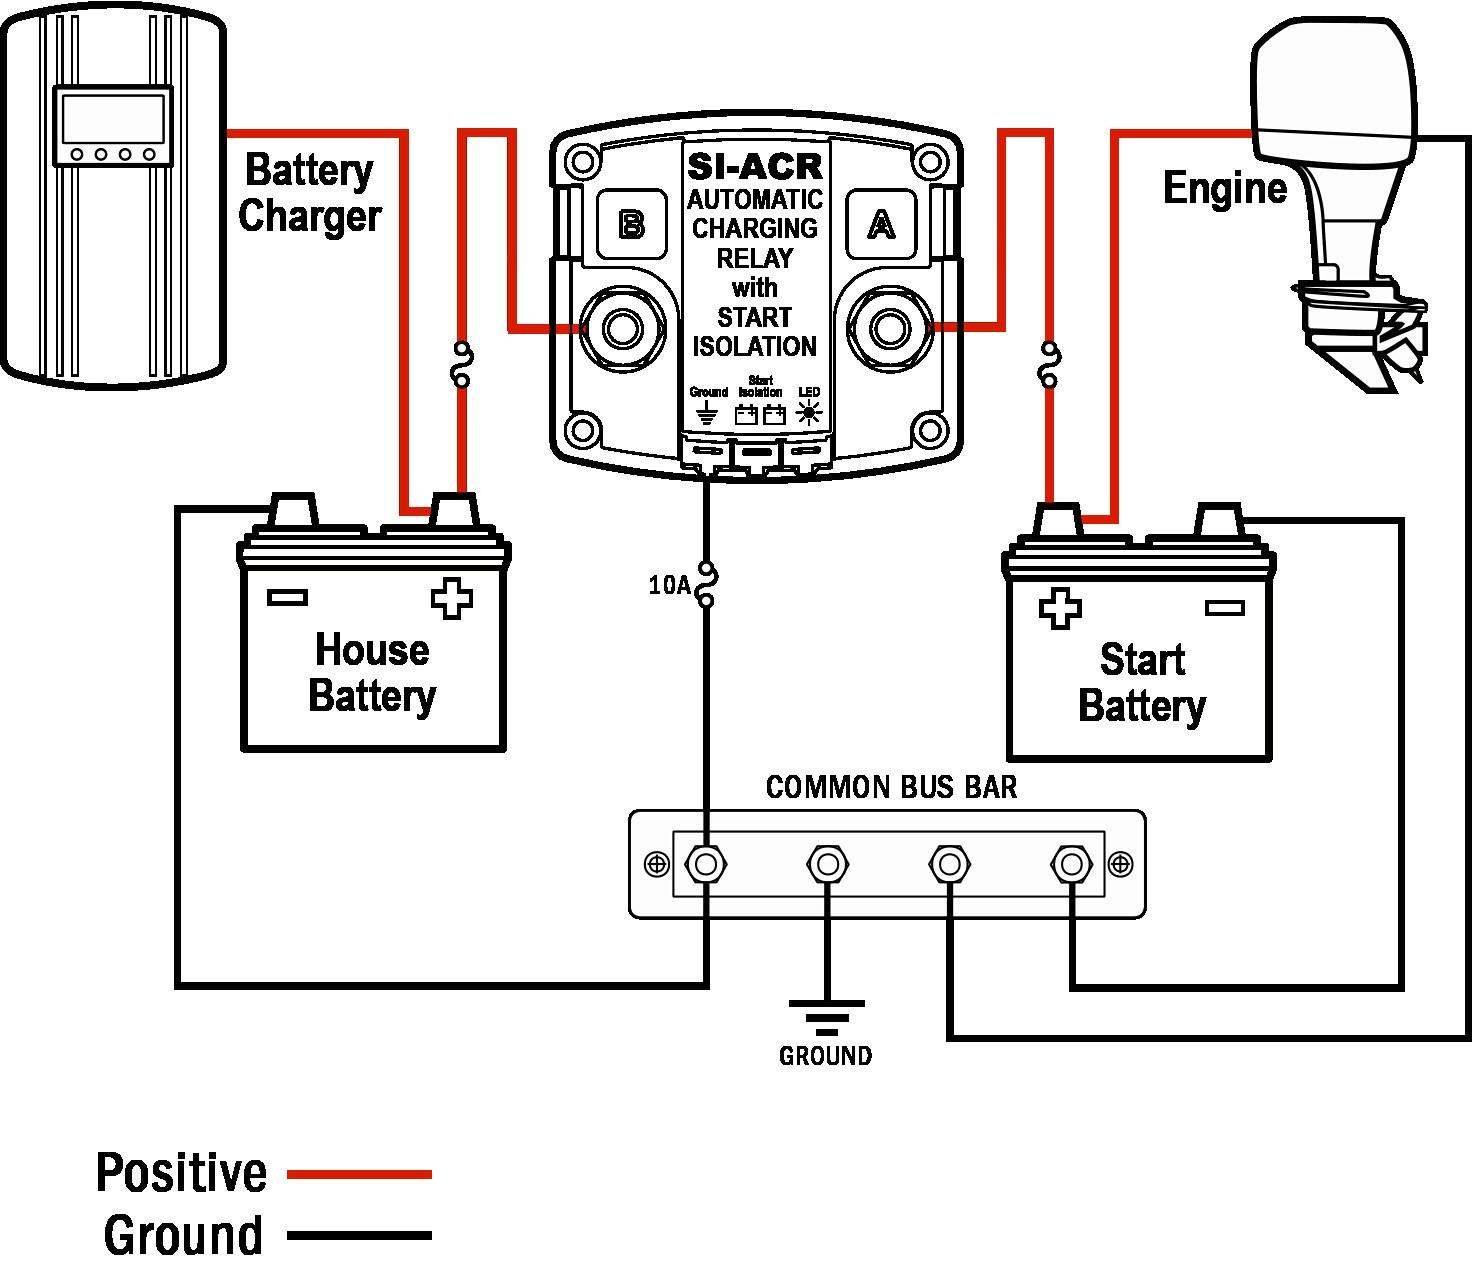 Marine Busbar Wiring Diagram Electrical Diagrams Elegant Bus Bar Image Amp Battery Switch